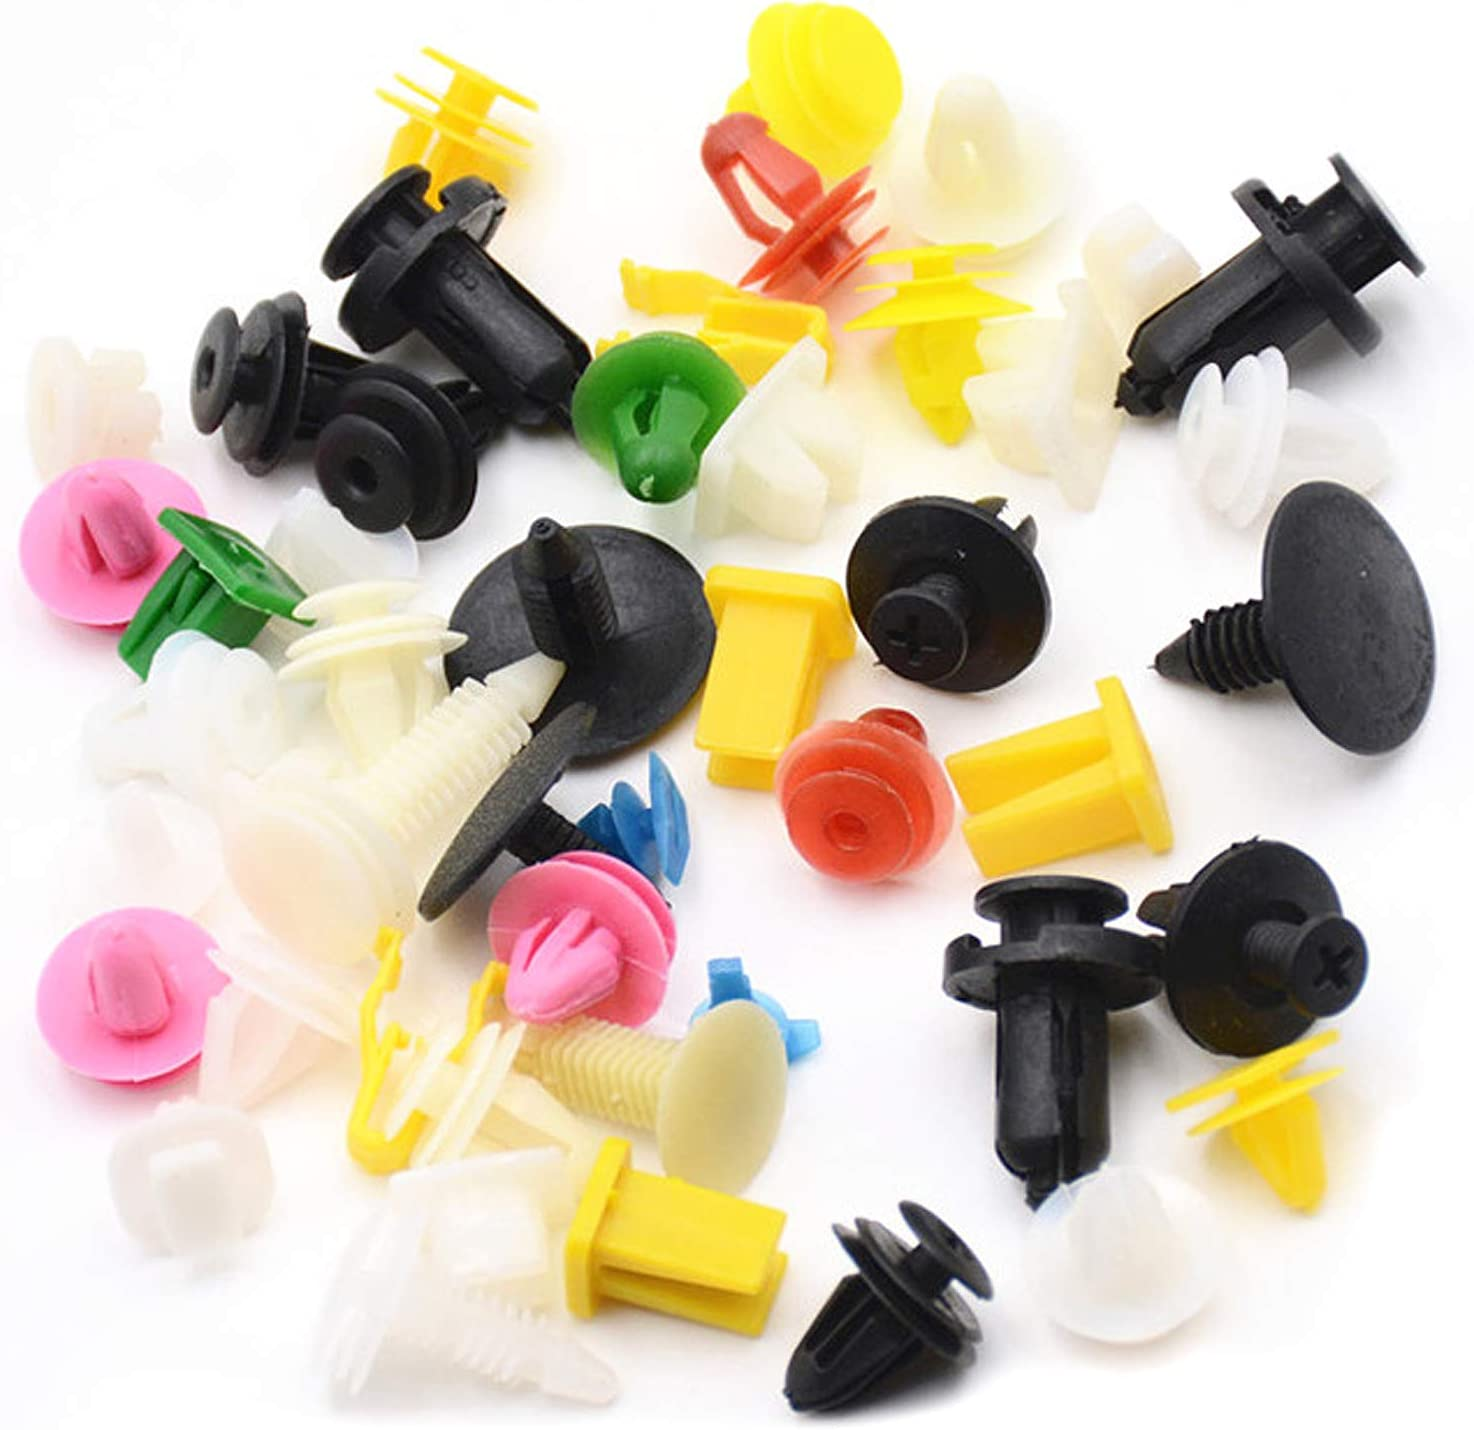 OTOTEC - Clips de plástico para Puerta de Coche, retenedor de Parachoques, Remaches de Tornillo para Panel de Empuje, Alrededor de 500 Unidades